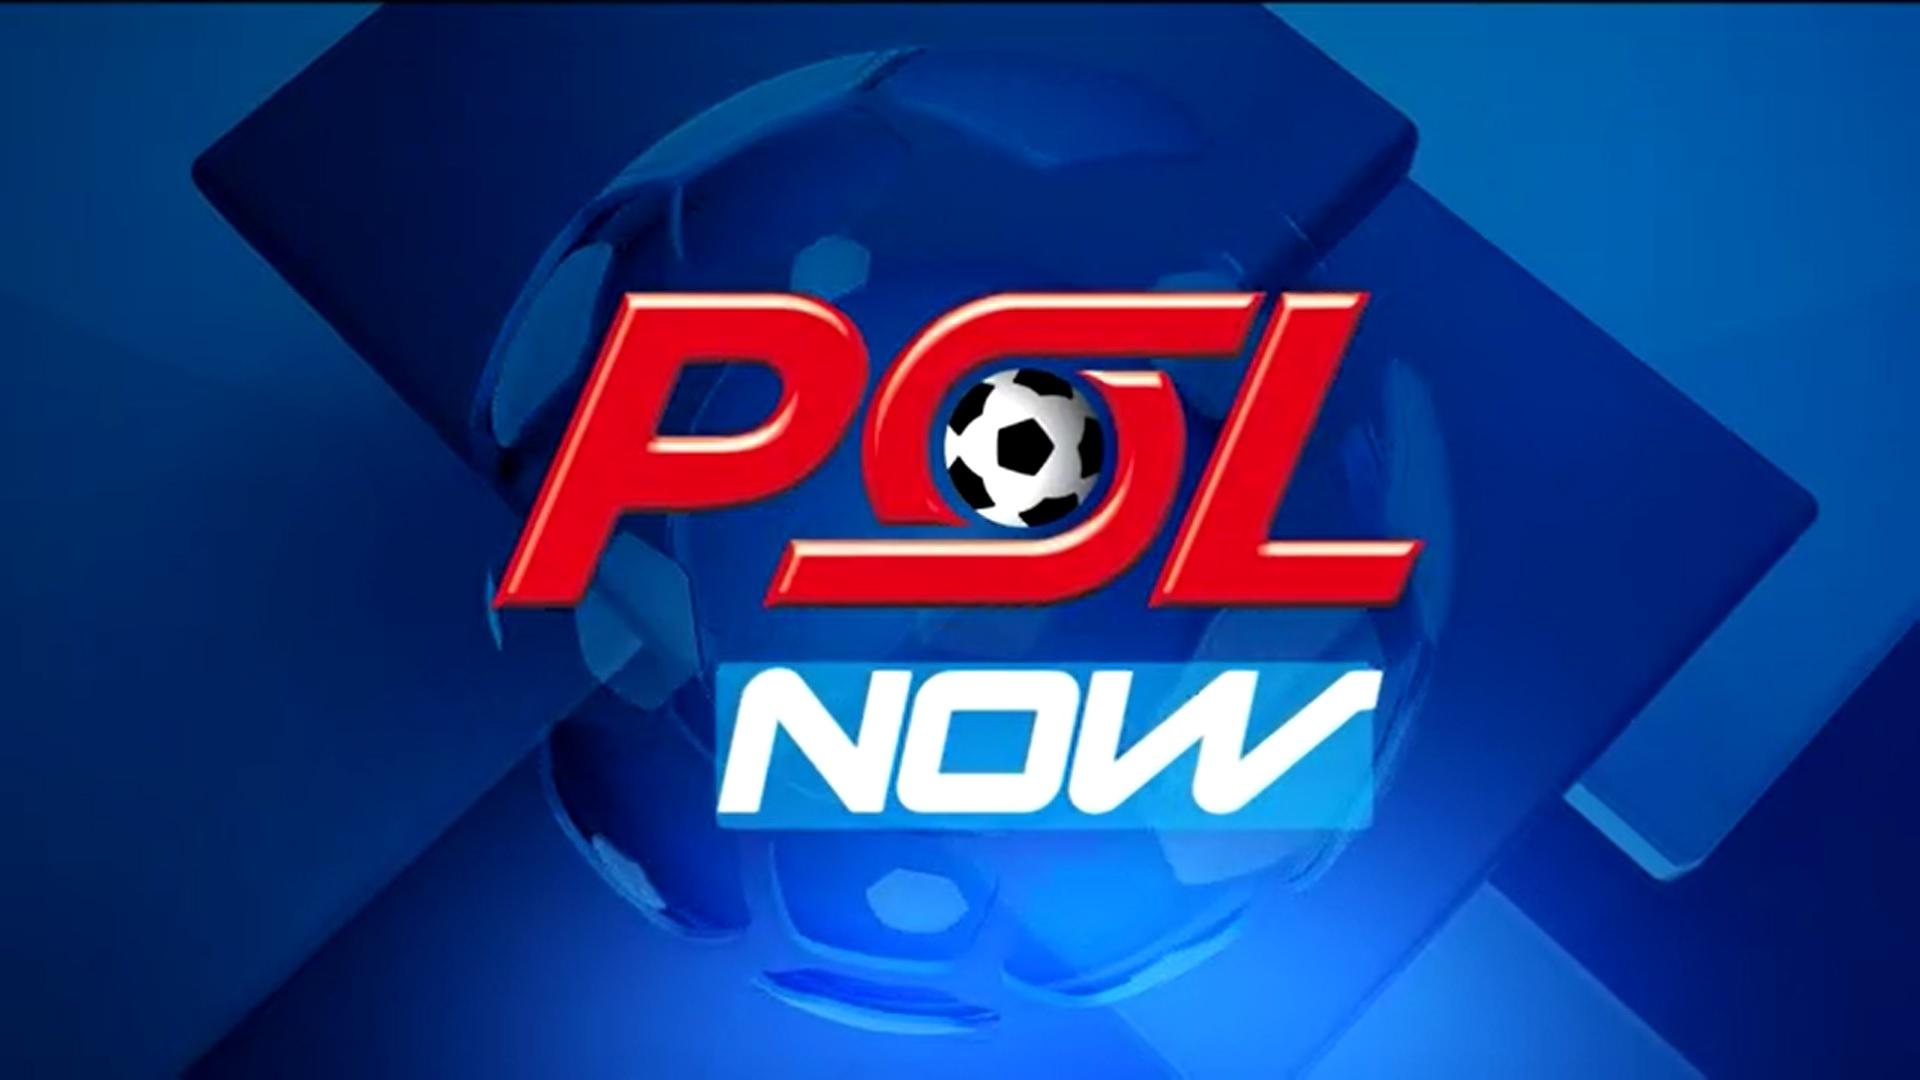 DStv Premiership | PSL Now | Episode 5